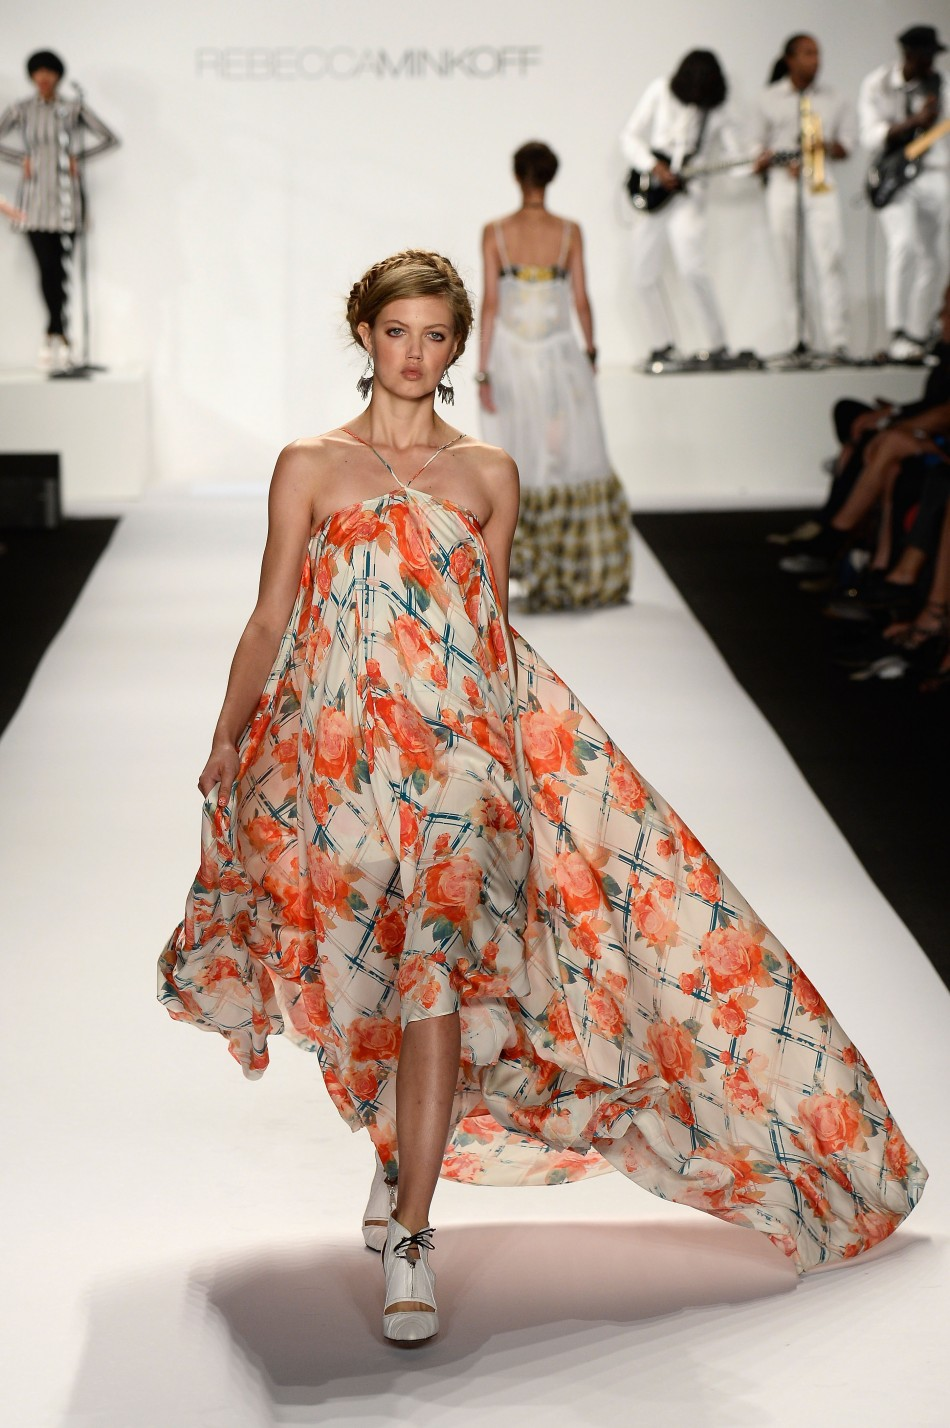 20583-rebecca-minkoff-spring-2014-new-york-fashion-week.jpg